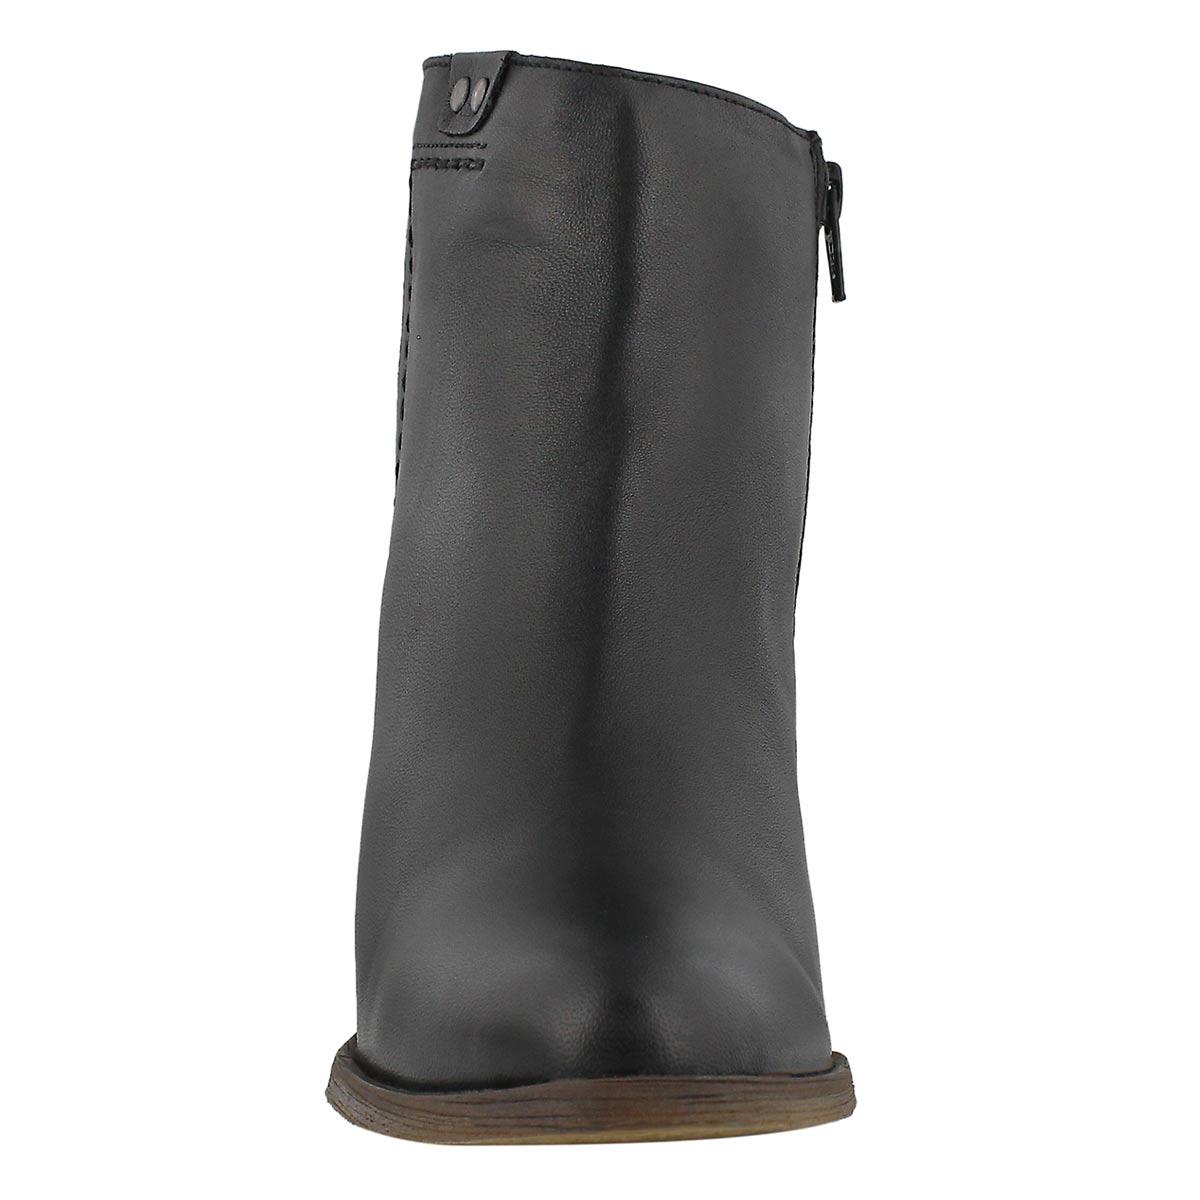 Lds Dacia black ankle bootie